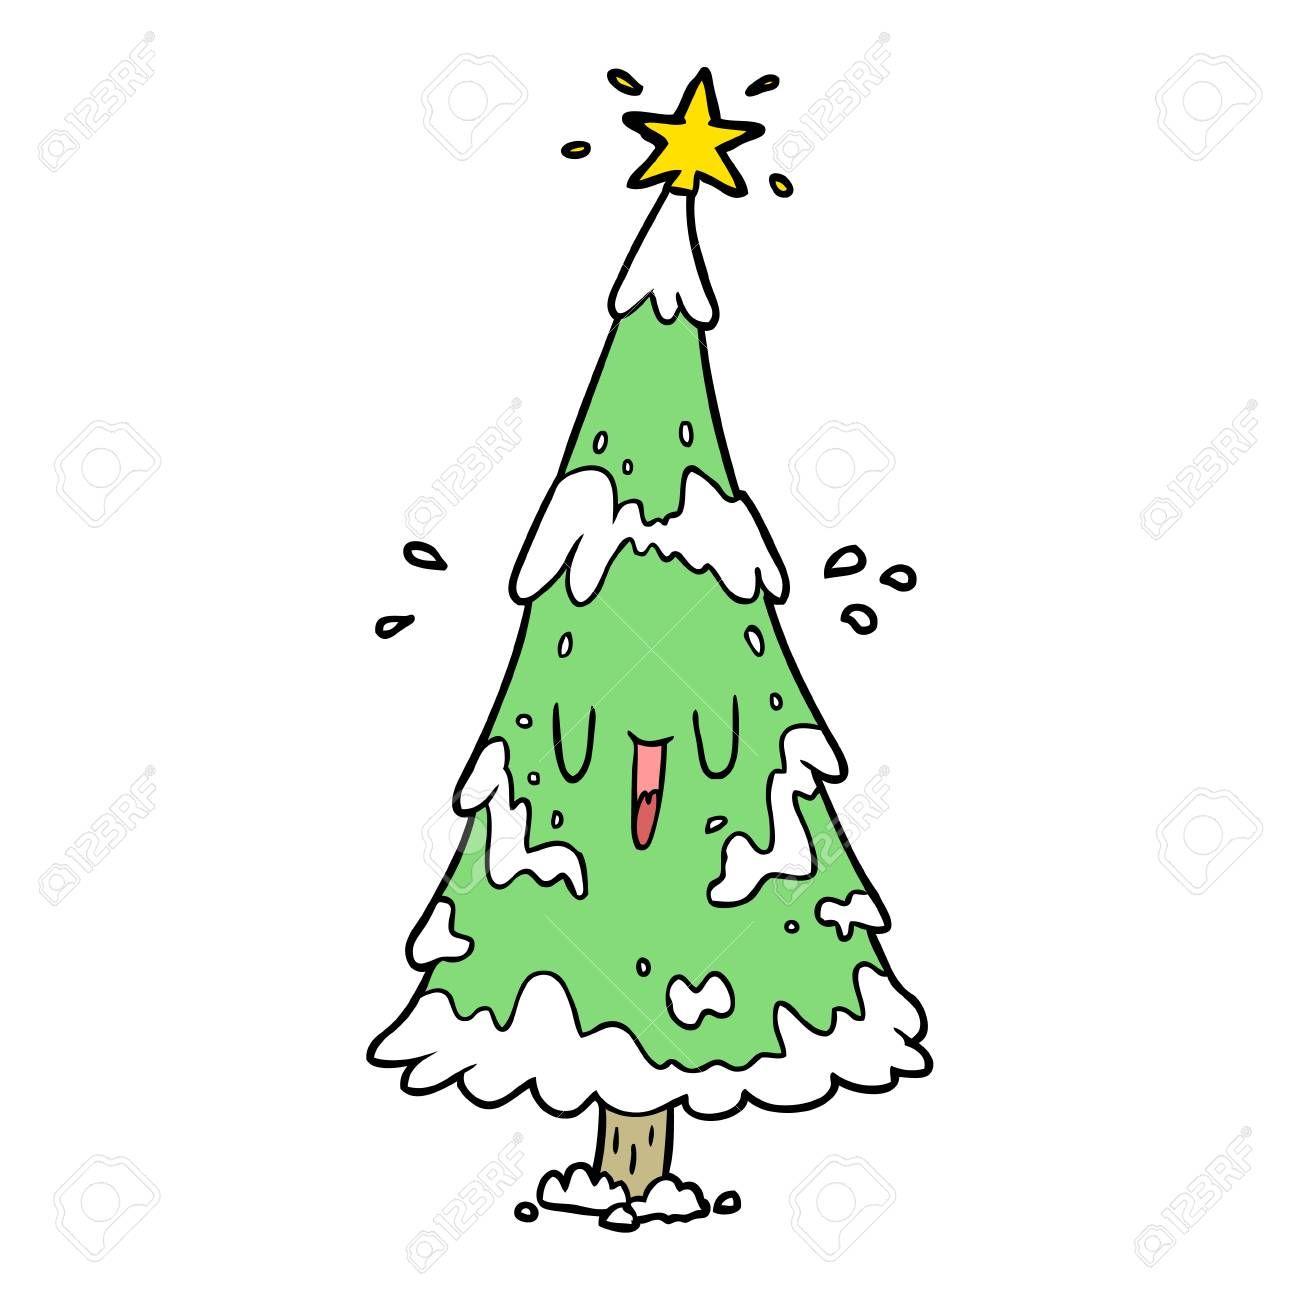 Cartoon Snowy Christmas Tree With Happy Face Sponsored Christmas Snowy Cartoon Face Happy Snowy Christmas Tree Cartoon Character Design Tutorial